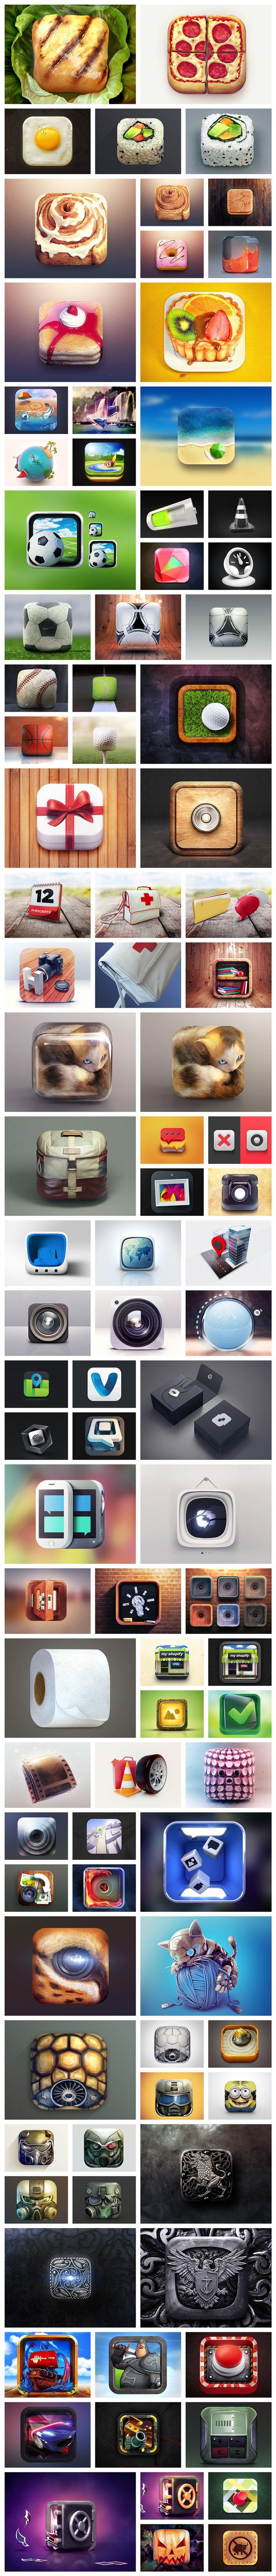 Dribbble - Full.jpg by Creativedash